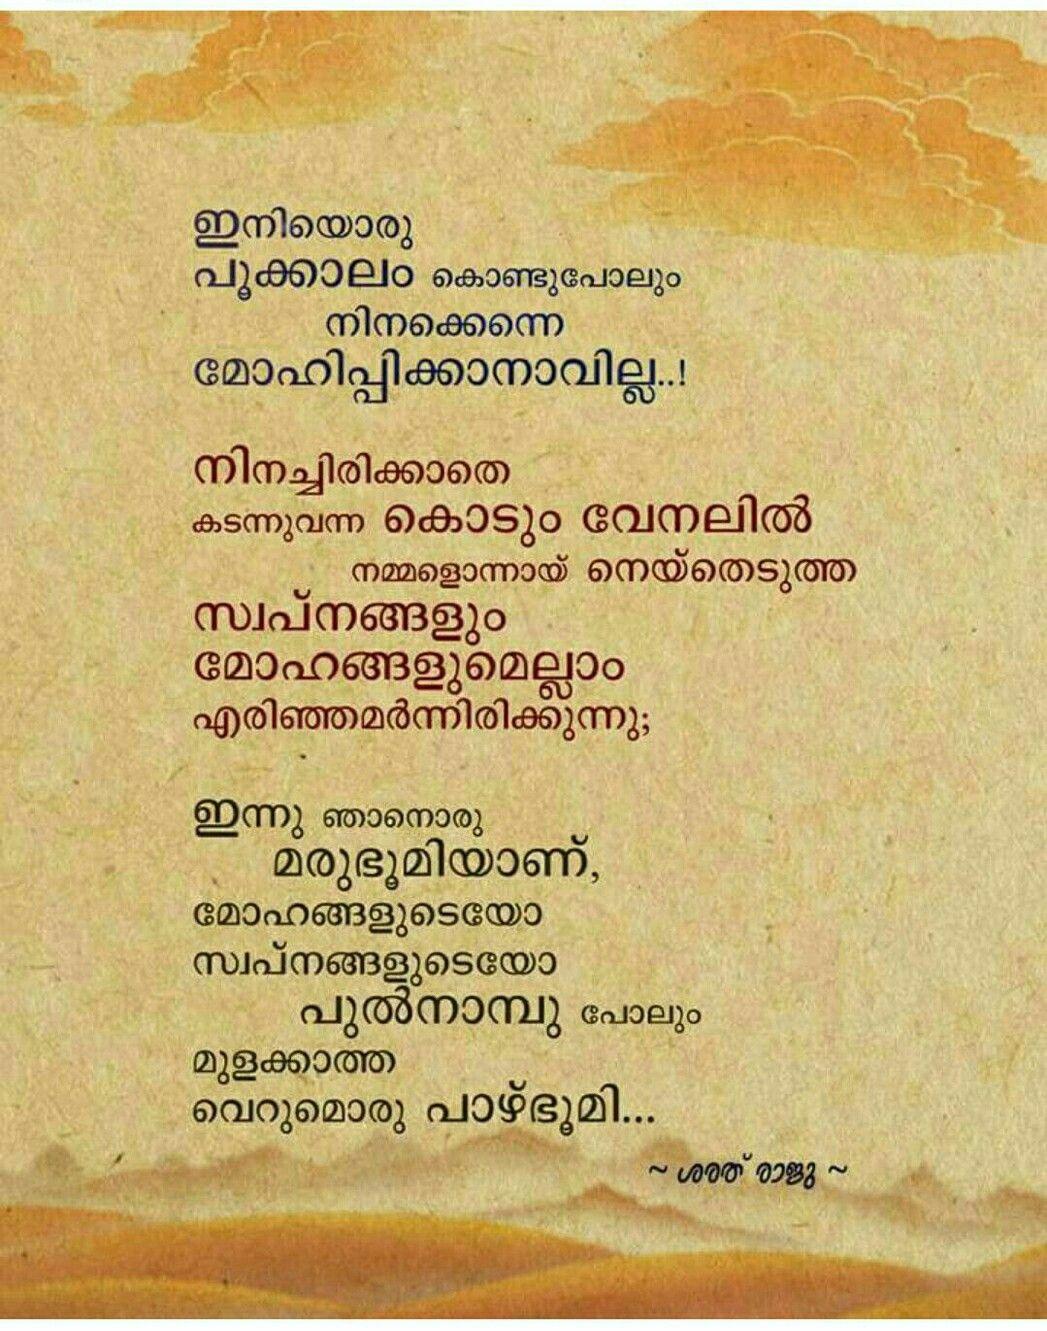 Pin By Haritha On Malayalam Pinterest Malayalam Quotes Quotes